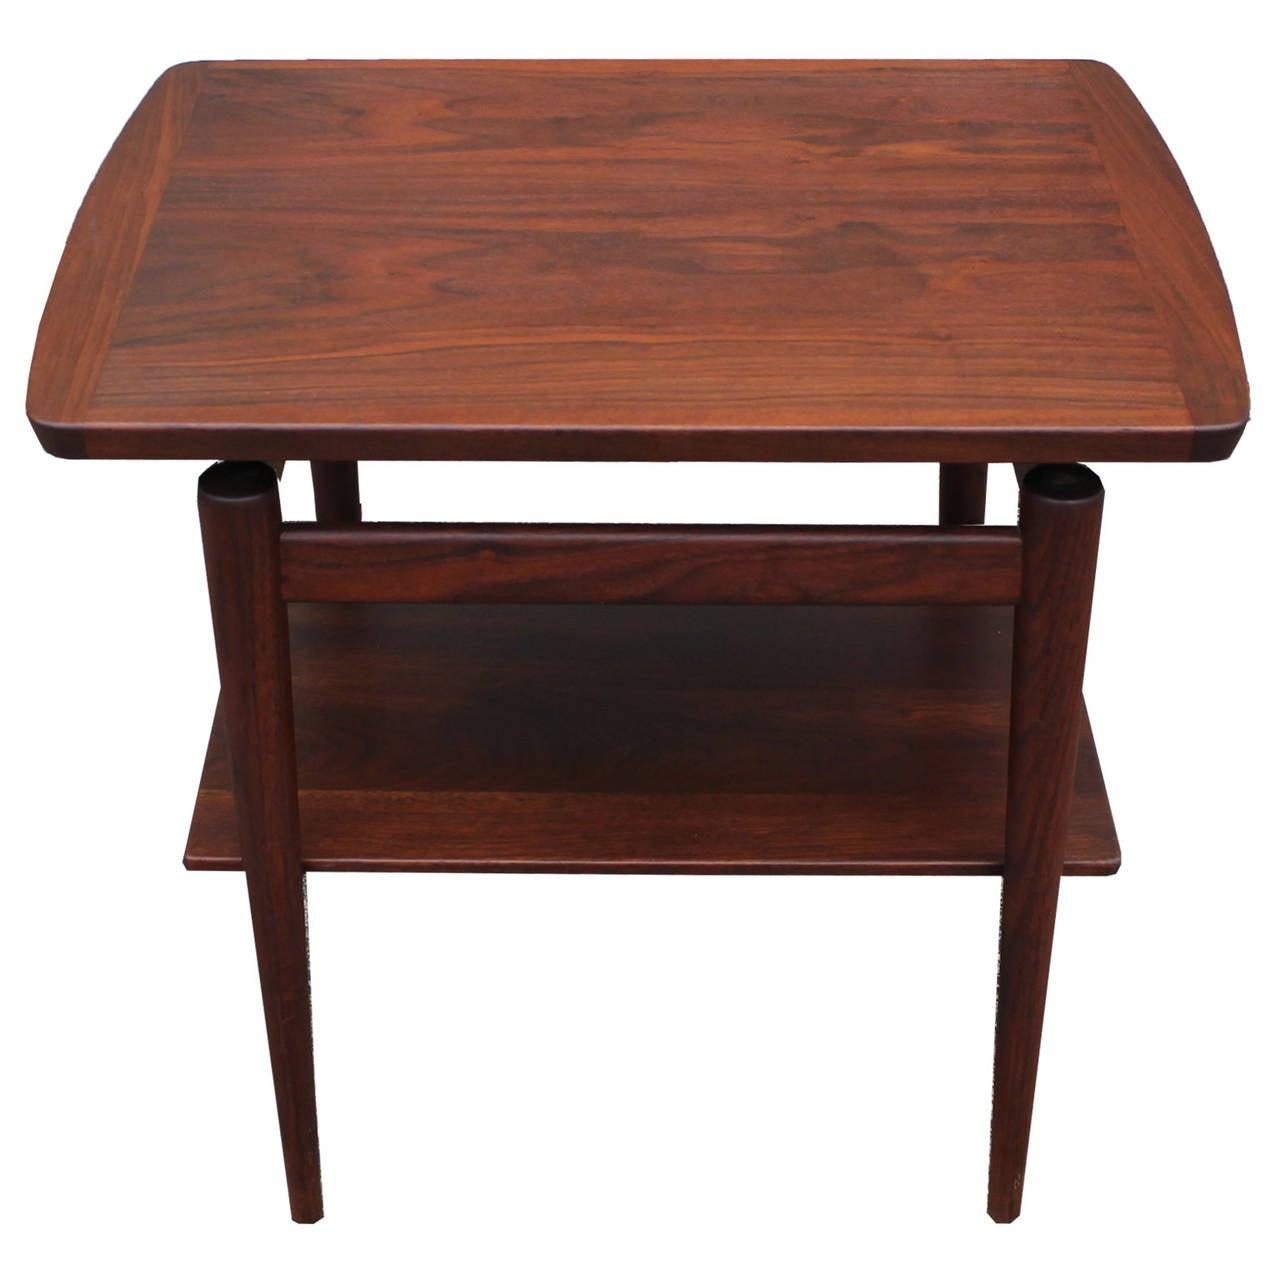 Jens risom floating bench for sale at 1stdibs - Rare Jens Risom Side Table 2